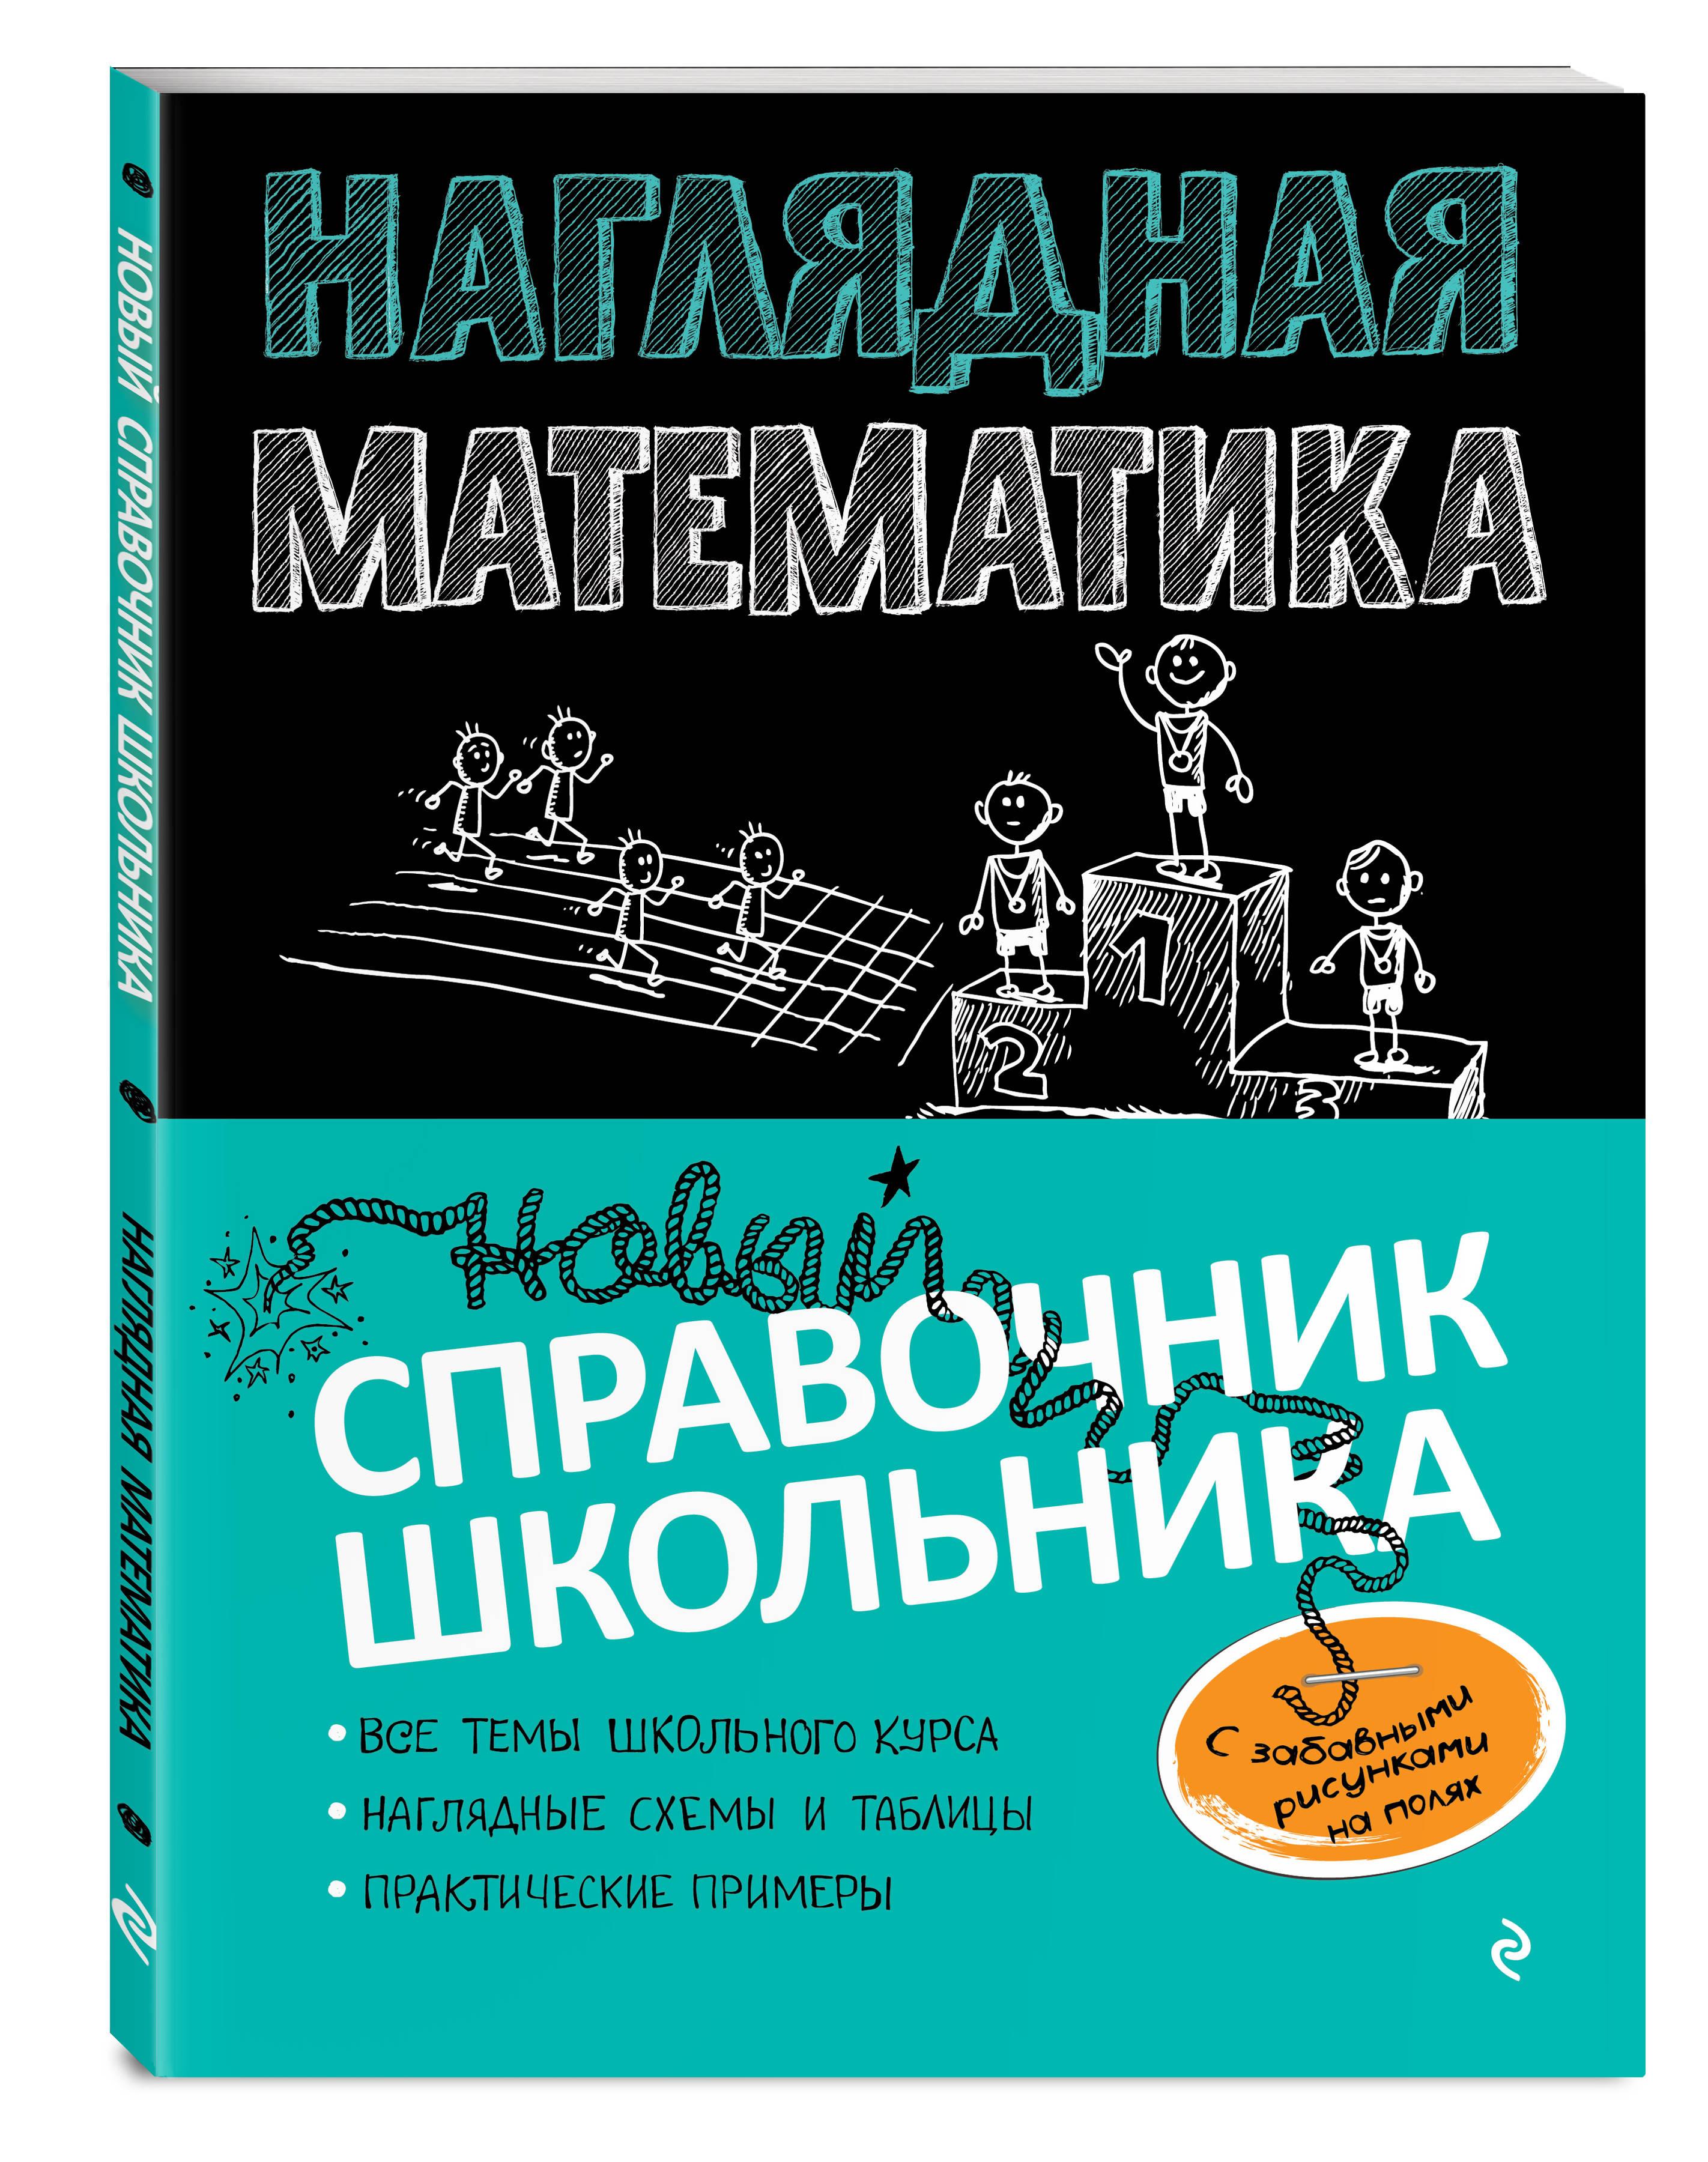 Наглядная математика ( Удалова Наталья Николаевна  )